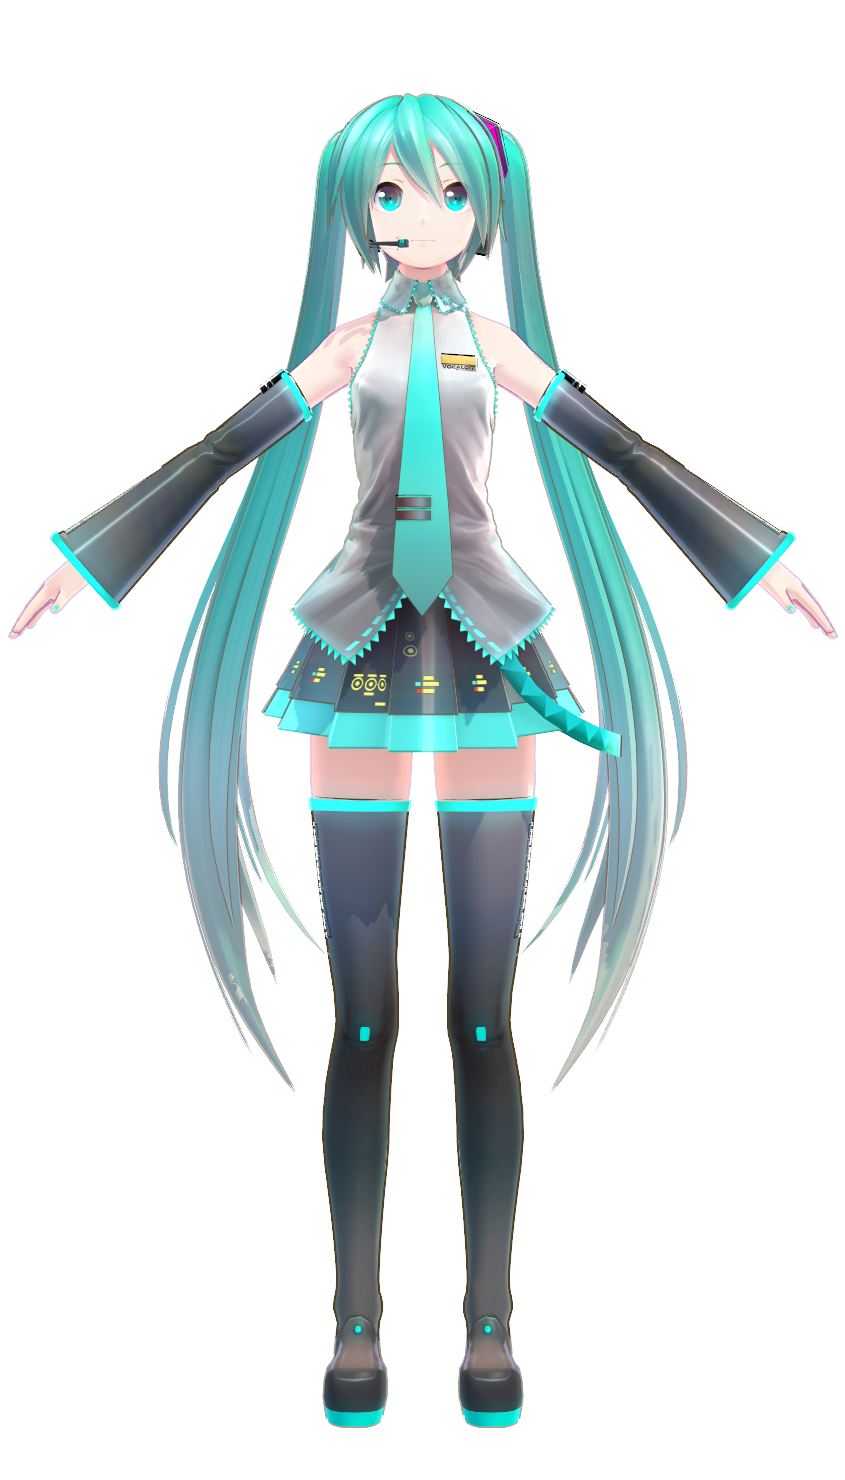 Miku Hatsune (YYB) | MikuMikuDance Wiki | FANDOM powered by